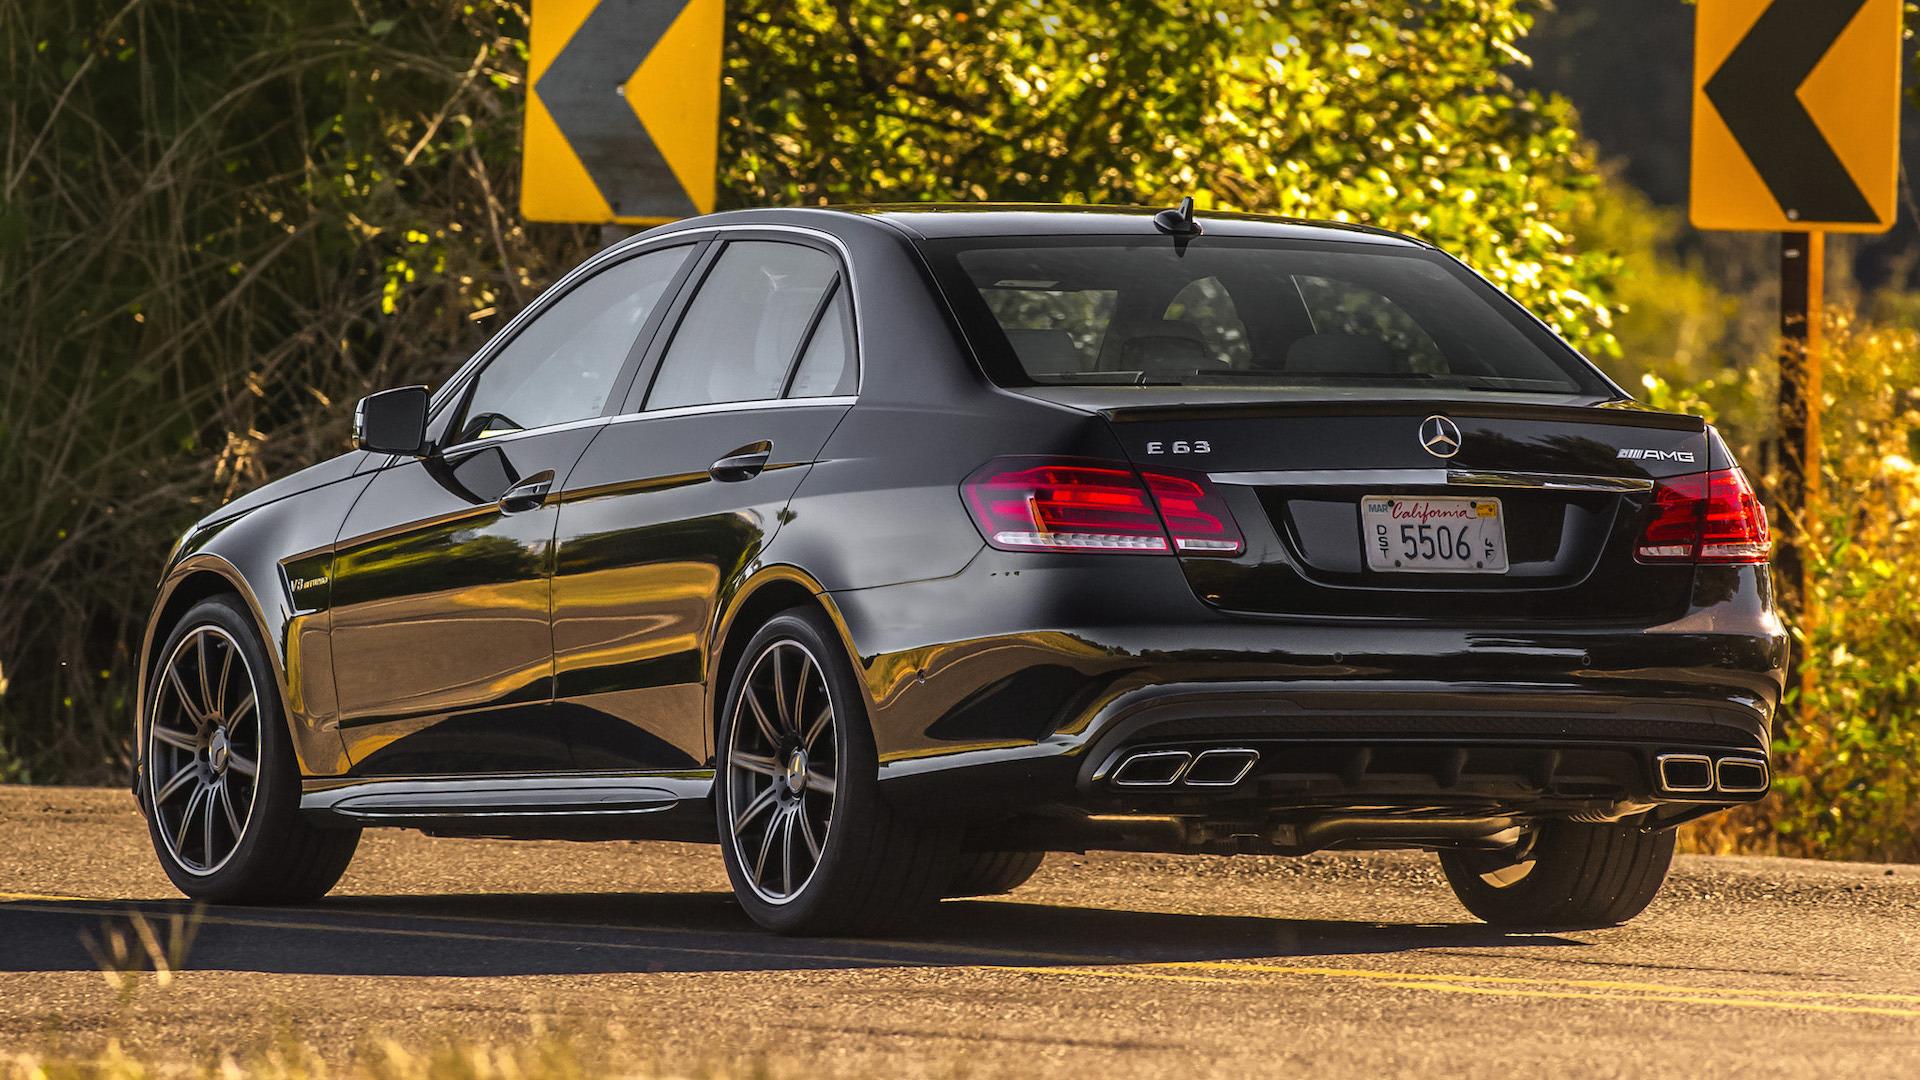 2016 Mercedes Benz Amg E 63 Sedan >> Mercedes Working On Drift Mode For Next Amg E63